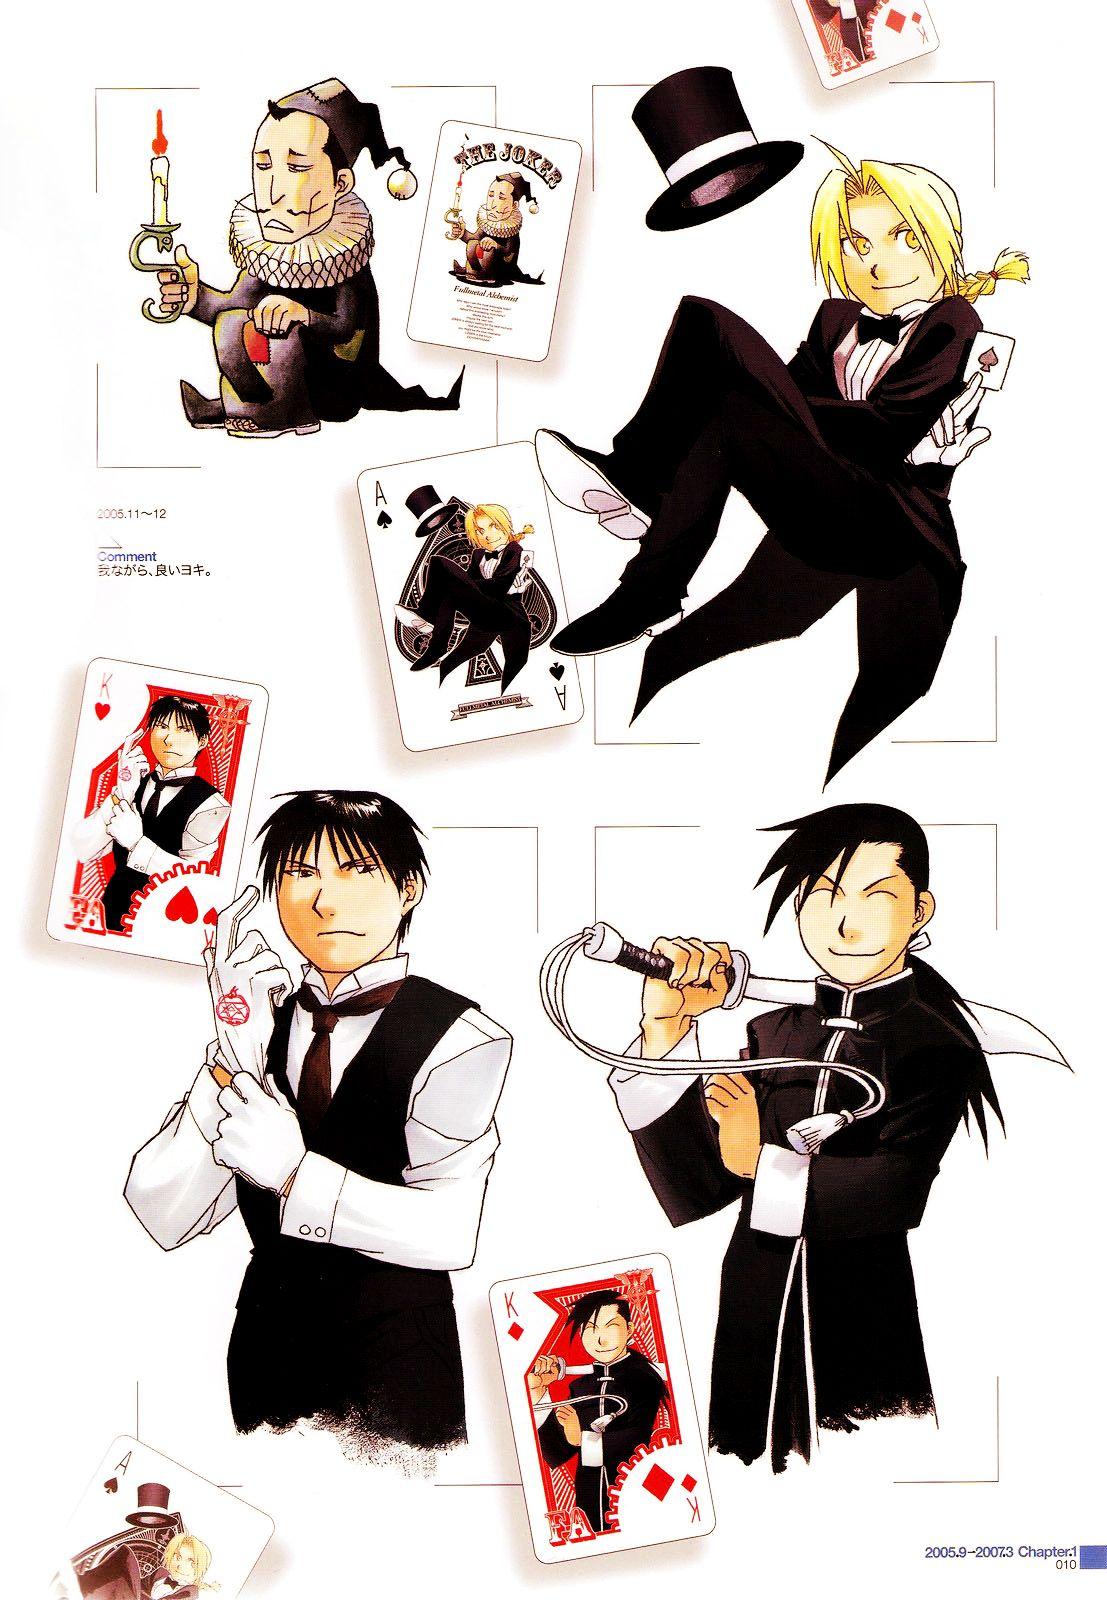 Fullmetal Alchemist Brotherhood Fullmetal Alchemist